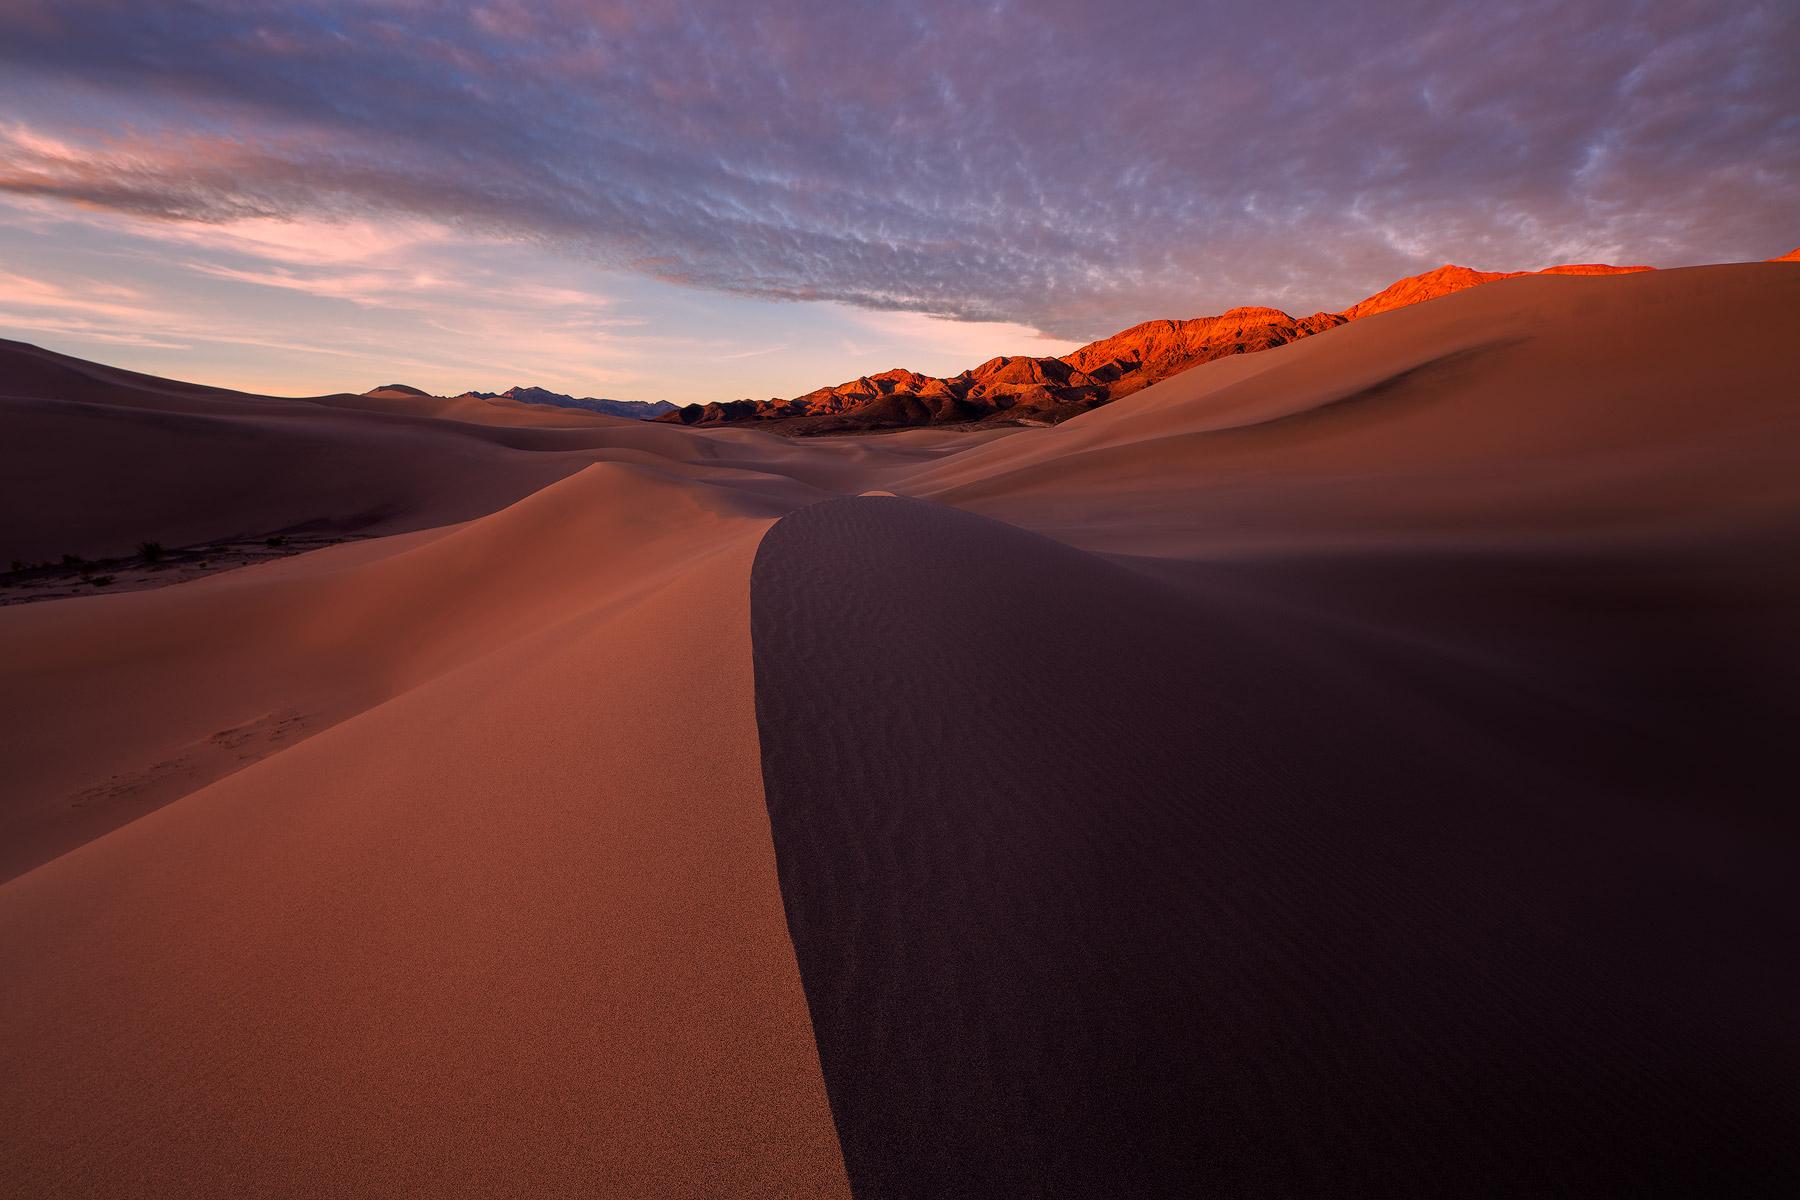 Last light on Ibex Dunes, Death Valley National Park, California.